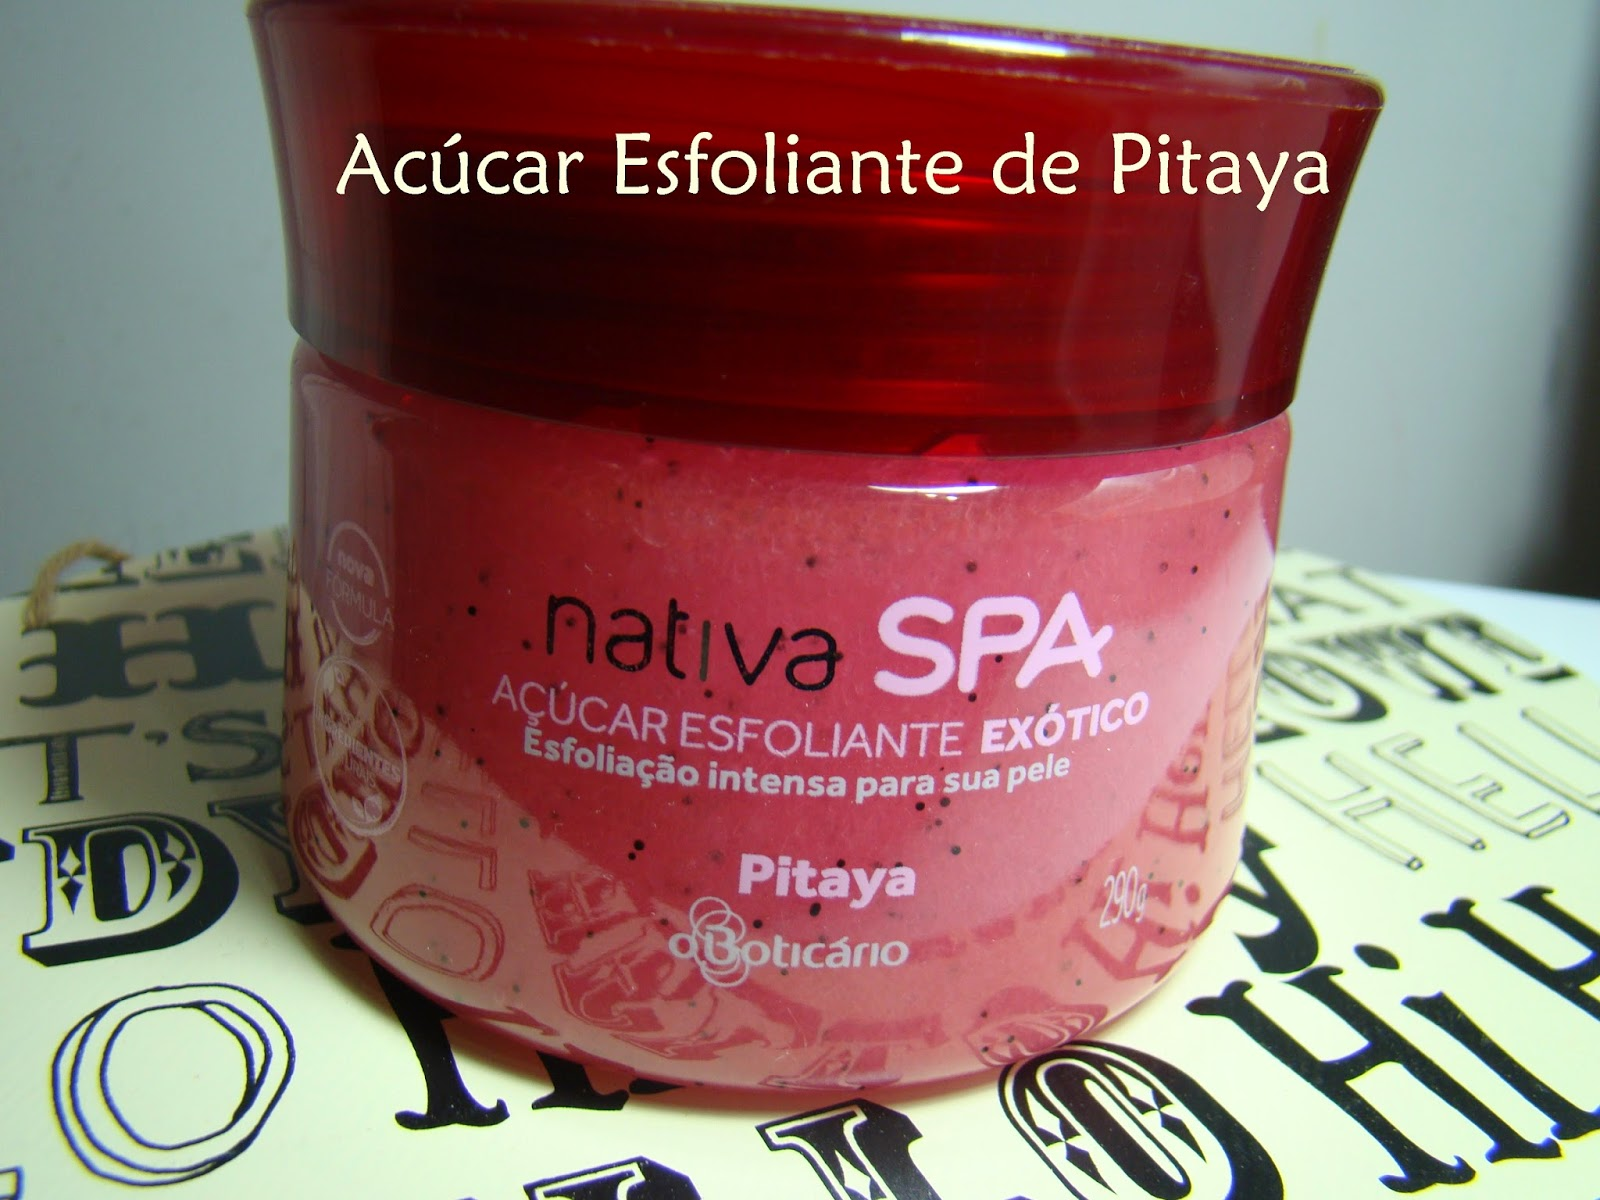 Acúcar Esfoliante Exótico de Pitaya